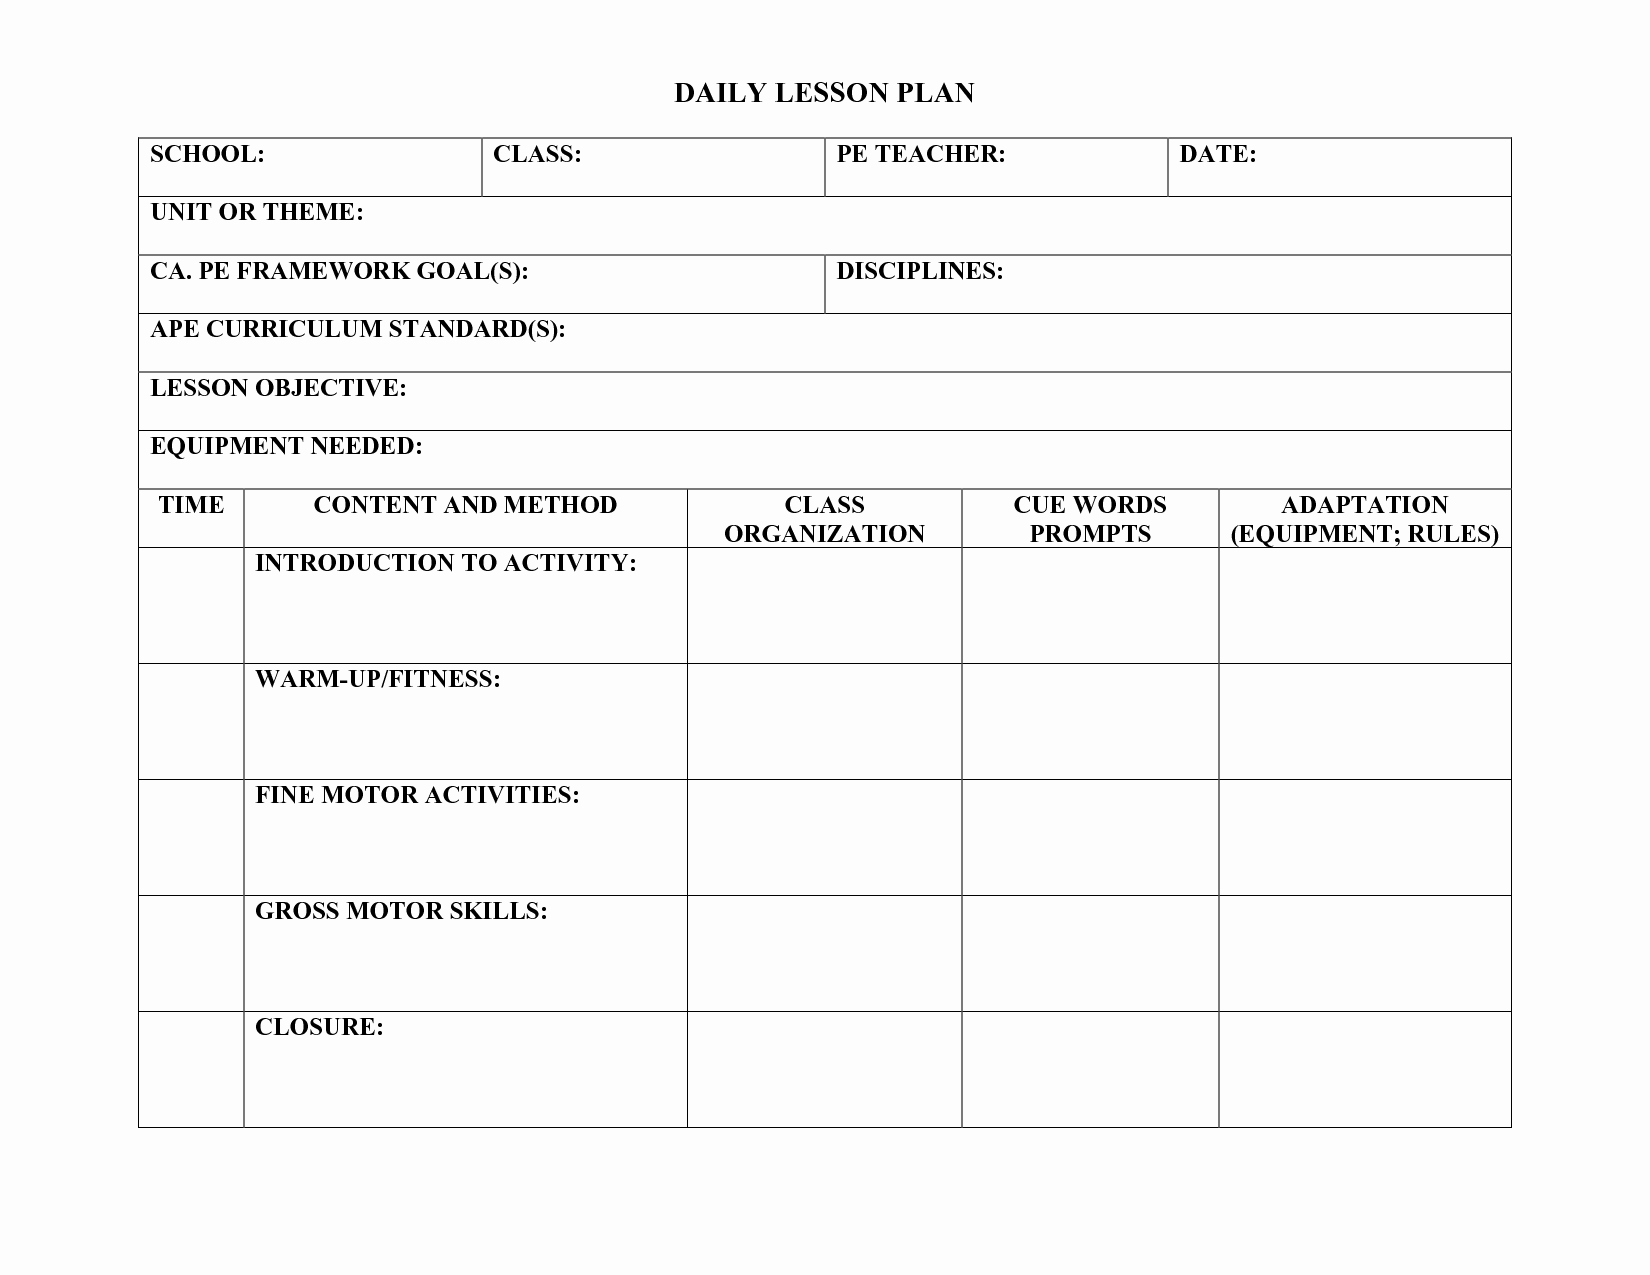 Weekly Lesson Plan Templates Elementary Elegant Pe Lesson Plan Template Education